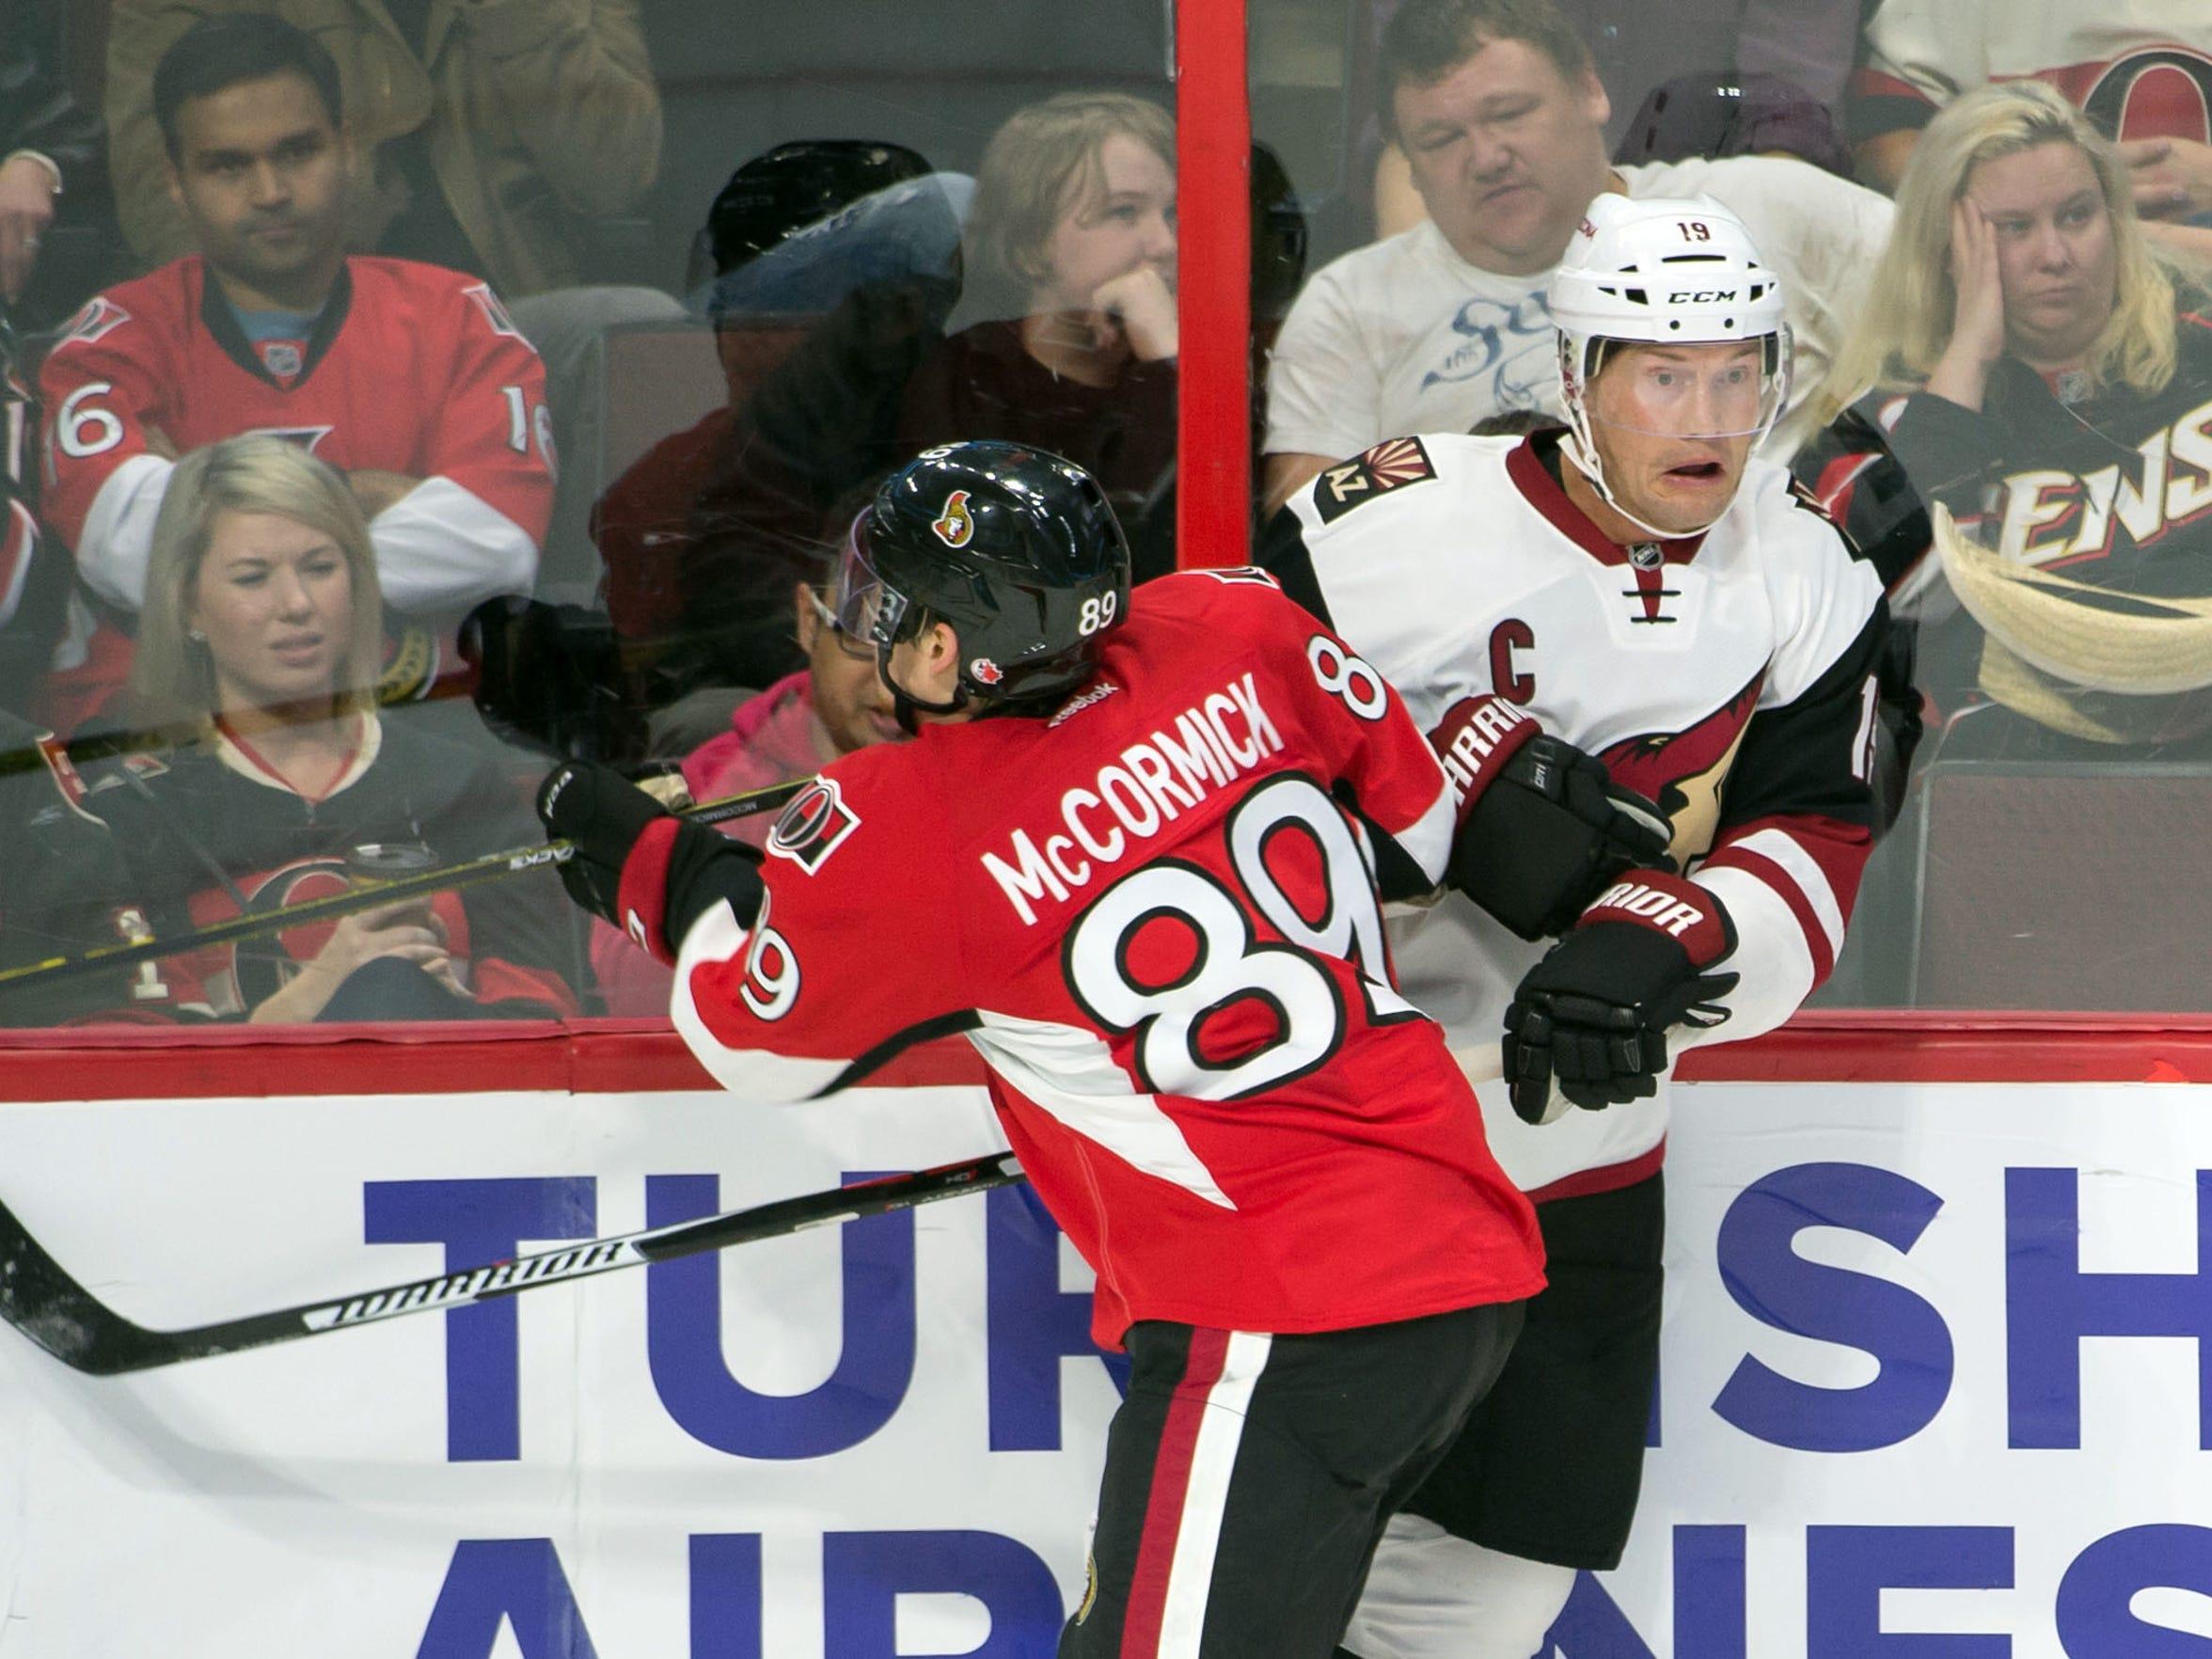 Green Bay Notre Dame product Max McCormick checks Arizona Coyotes right wing Shane Doan in his NHL debut with the Ottawa Senators.